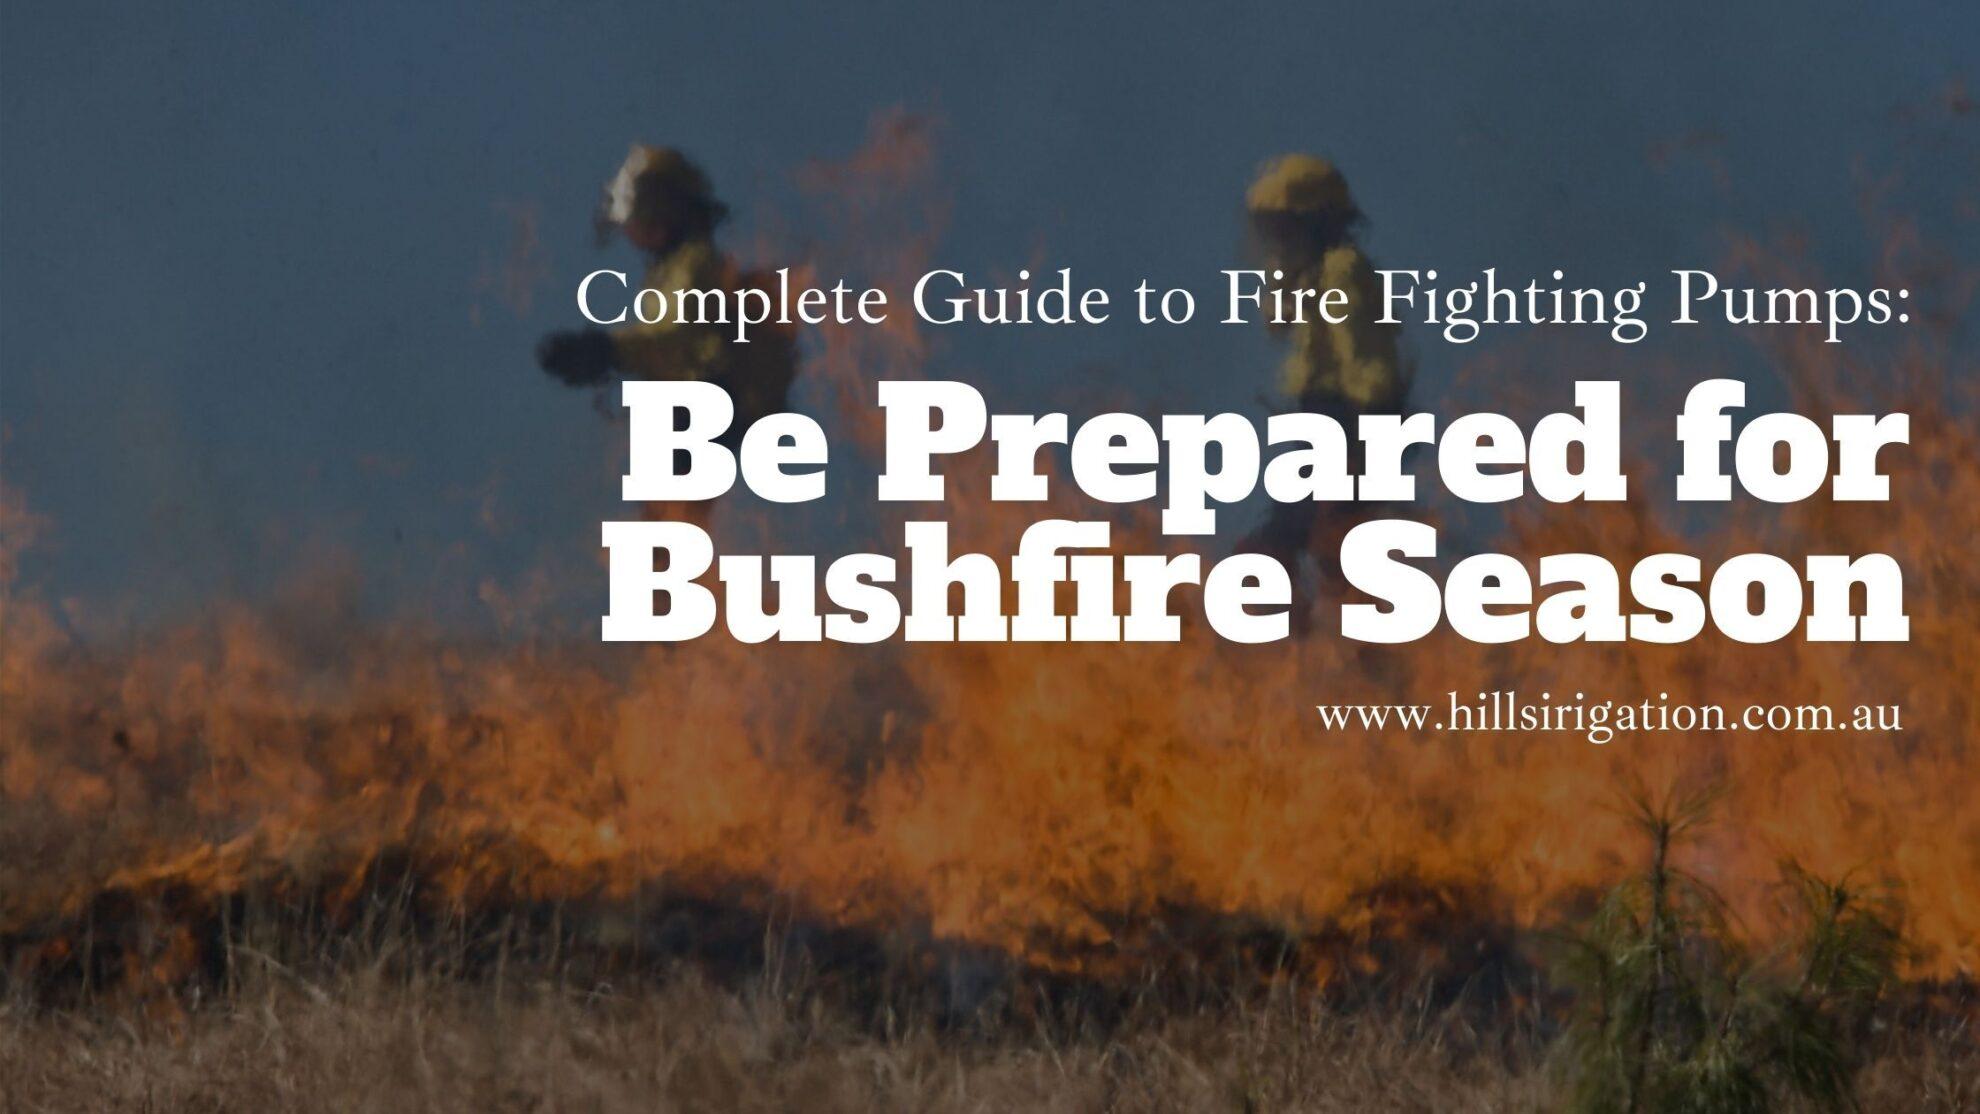 Complete Guide to Fire Fighting Pumps: Be Prepared for Bushfire Season